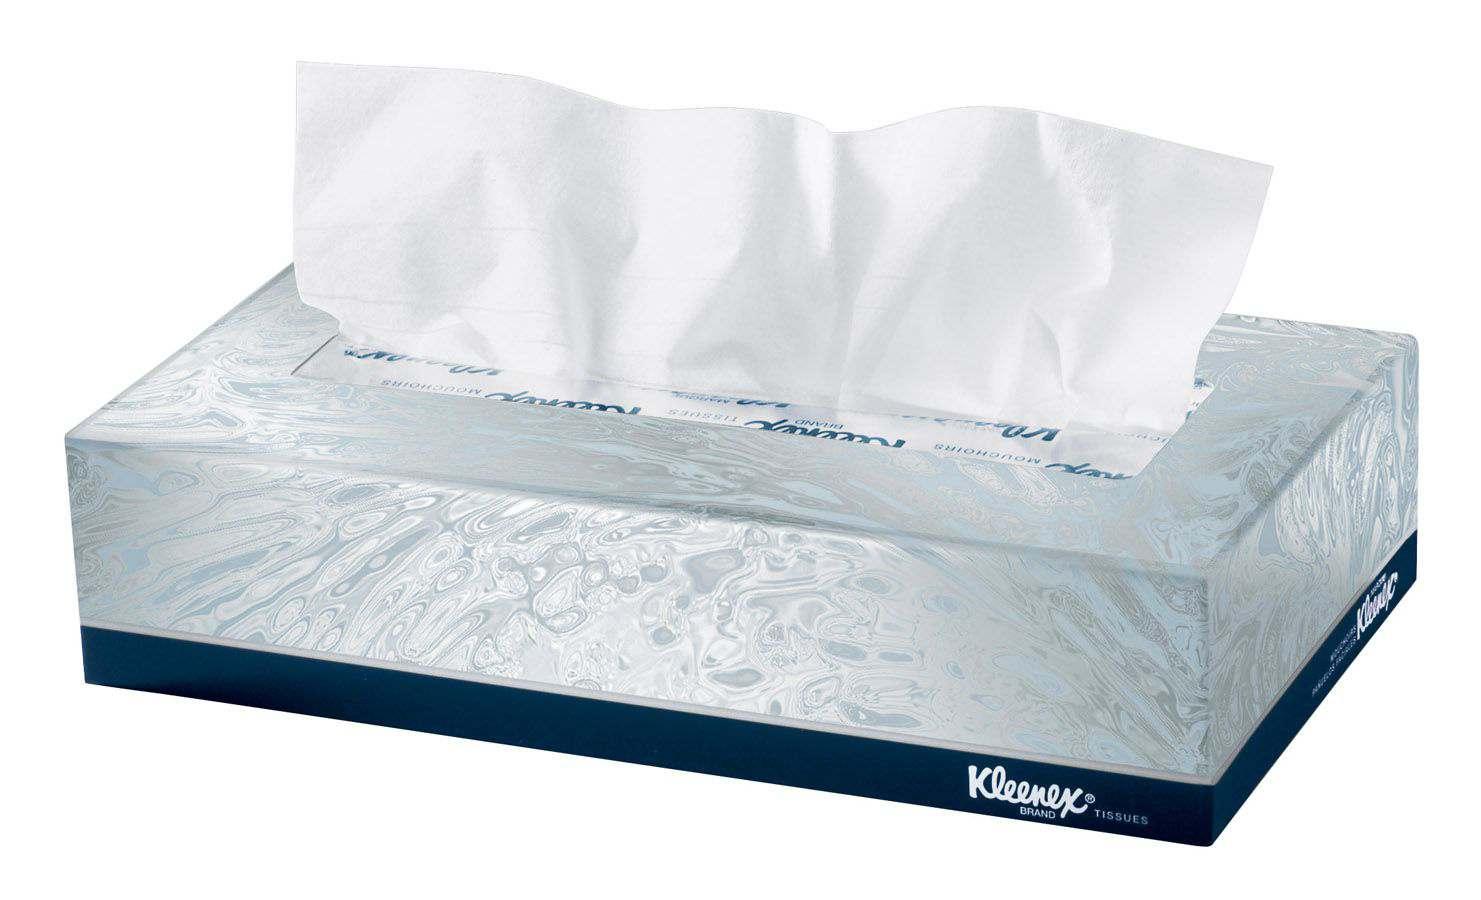 Kimberly-Clark Kleenex Facial Tissue - Wht, Each - Model 21400